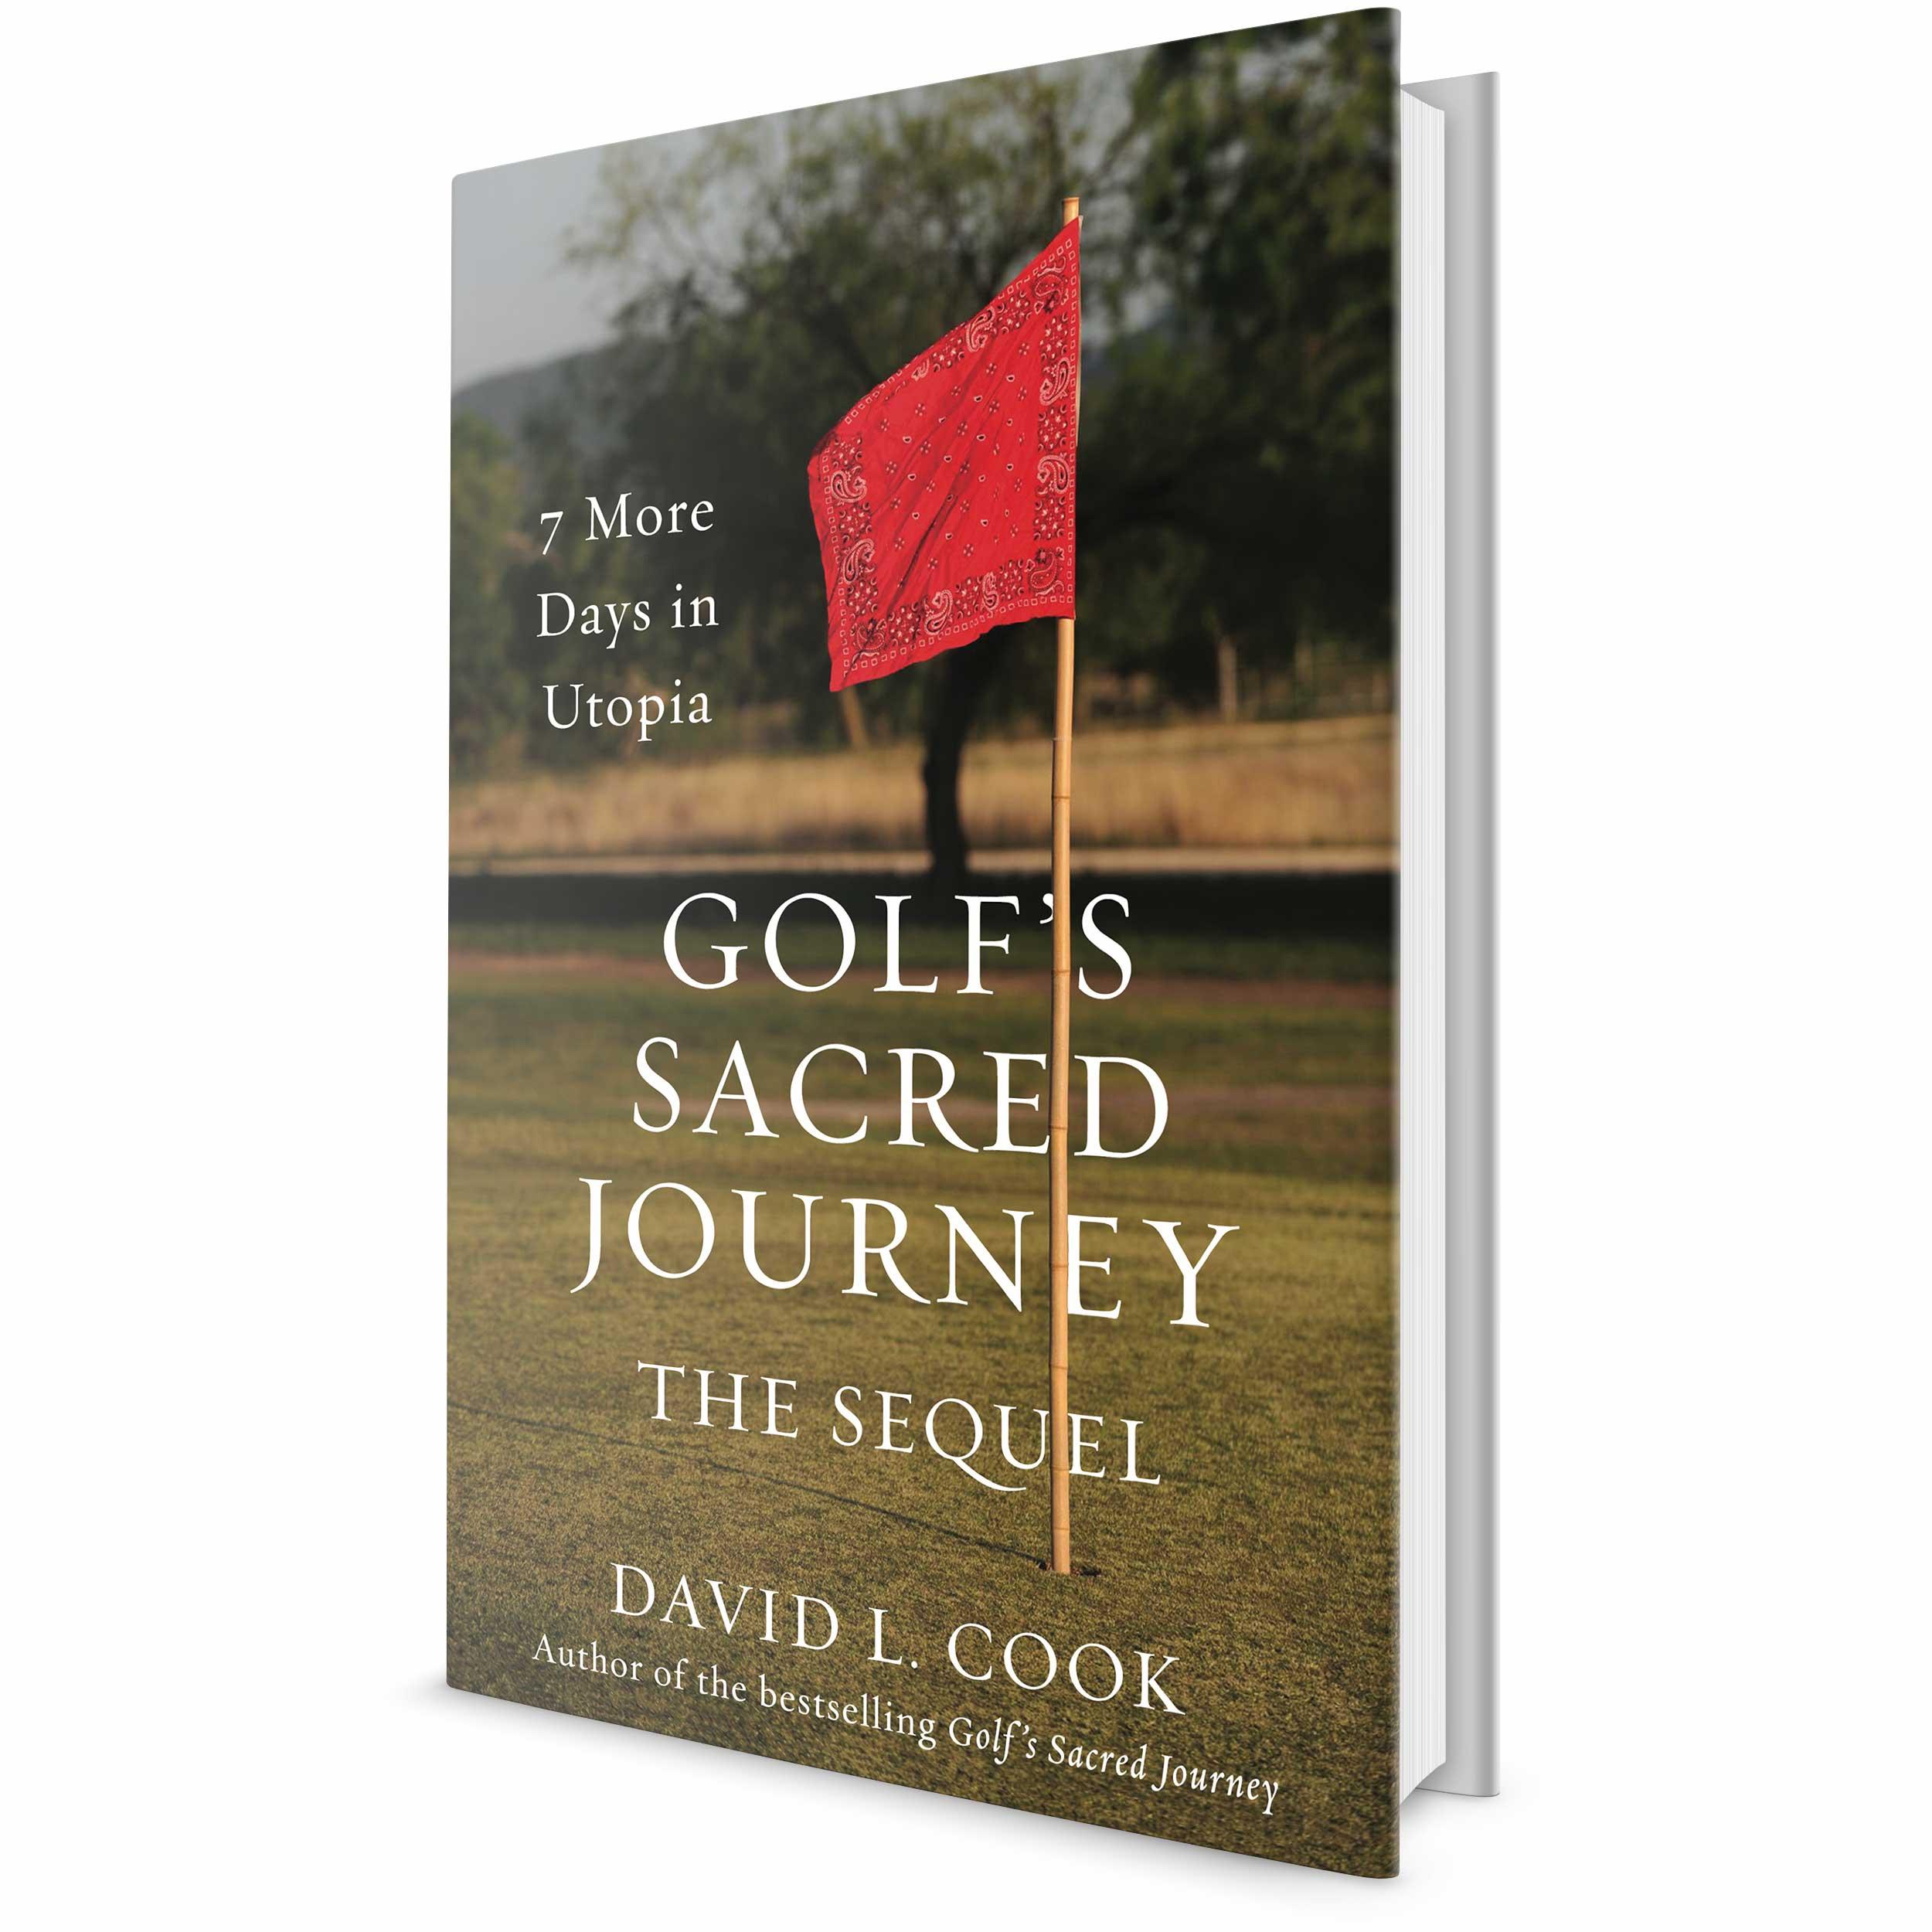 Golfs-Sacred-Journey-the-Sequel-2500.jpg